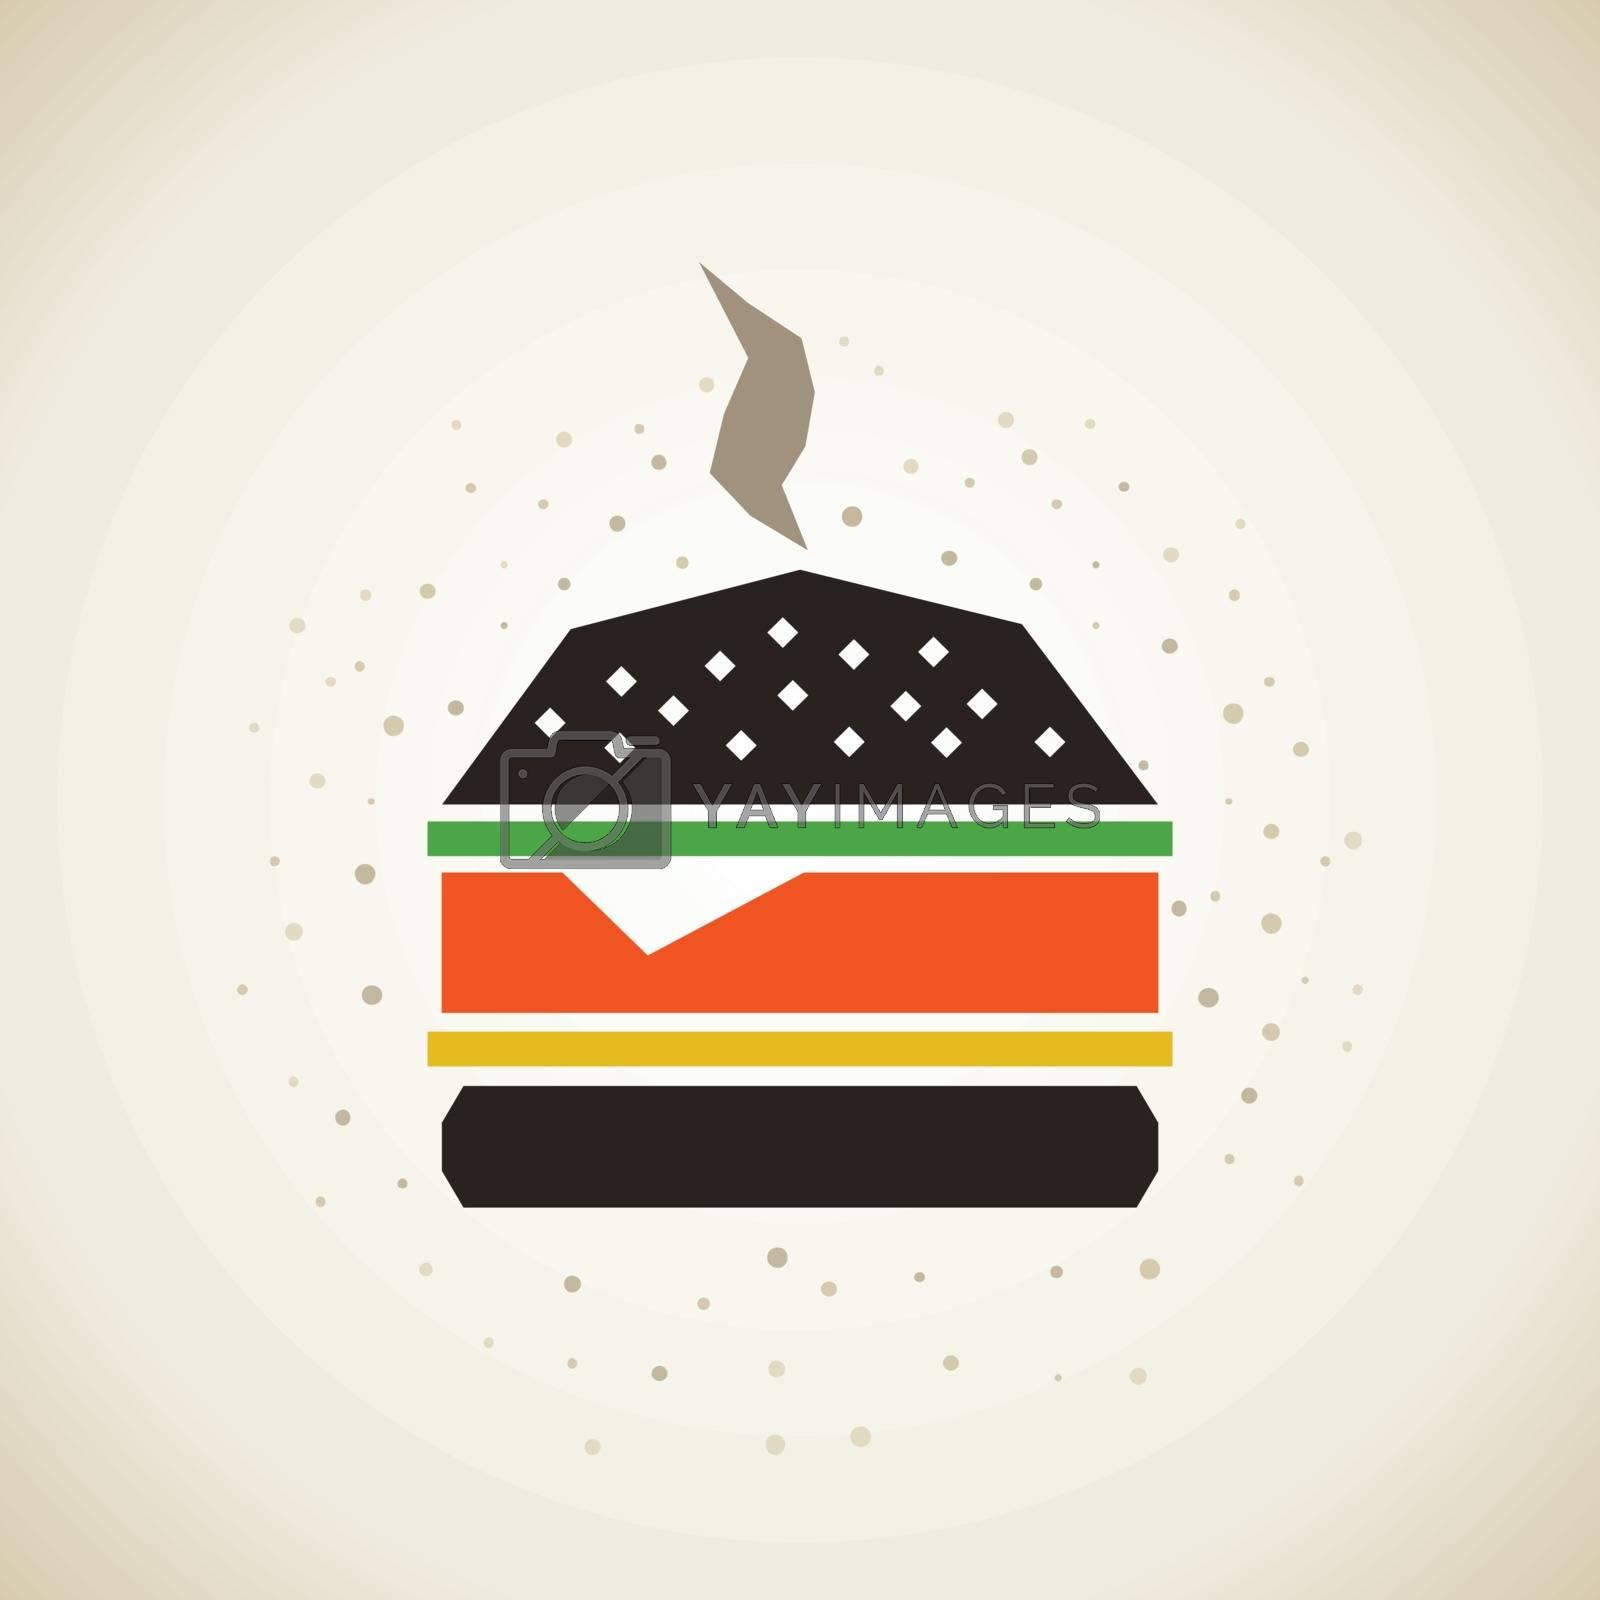 Hamburger3 by aleksander1